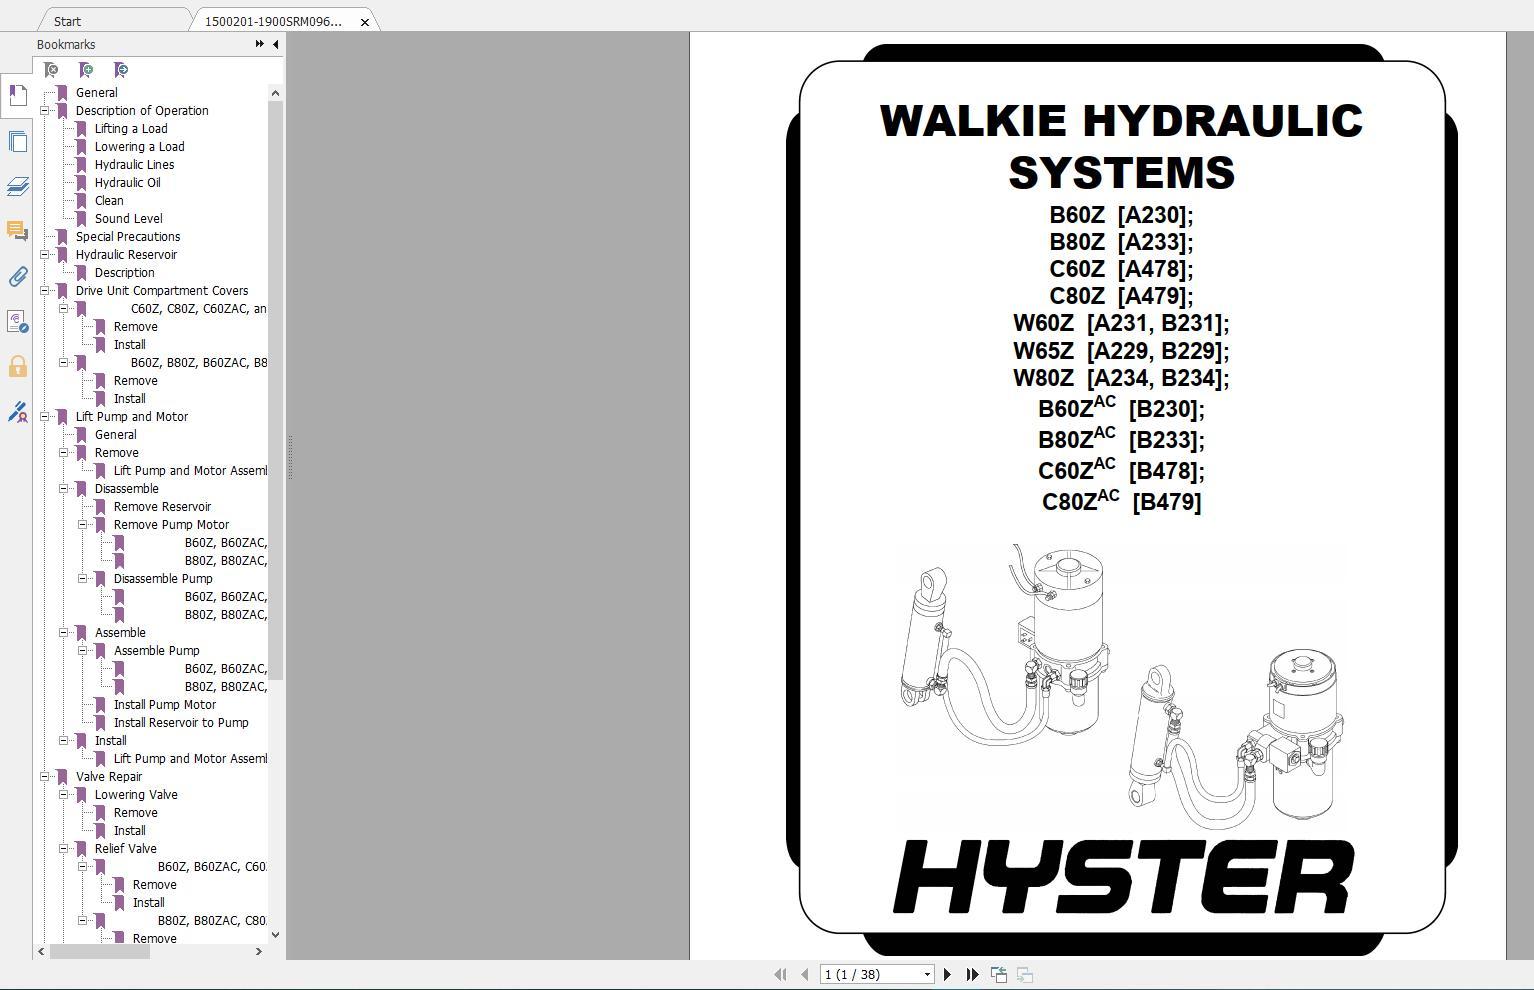 Hyster_Class_3_Electric_Motor_Hand_Trucks_Repair_Manuals8